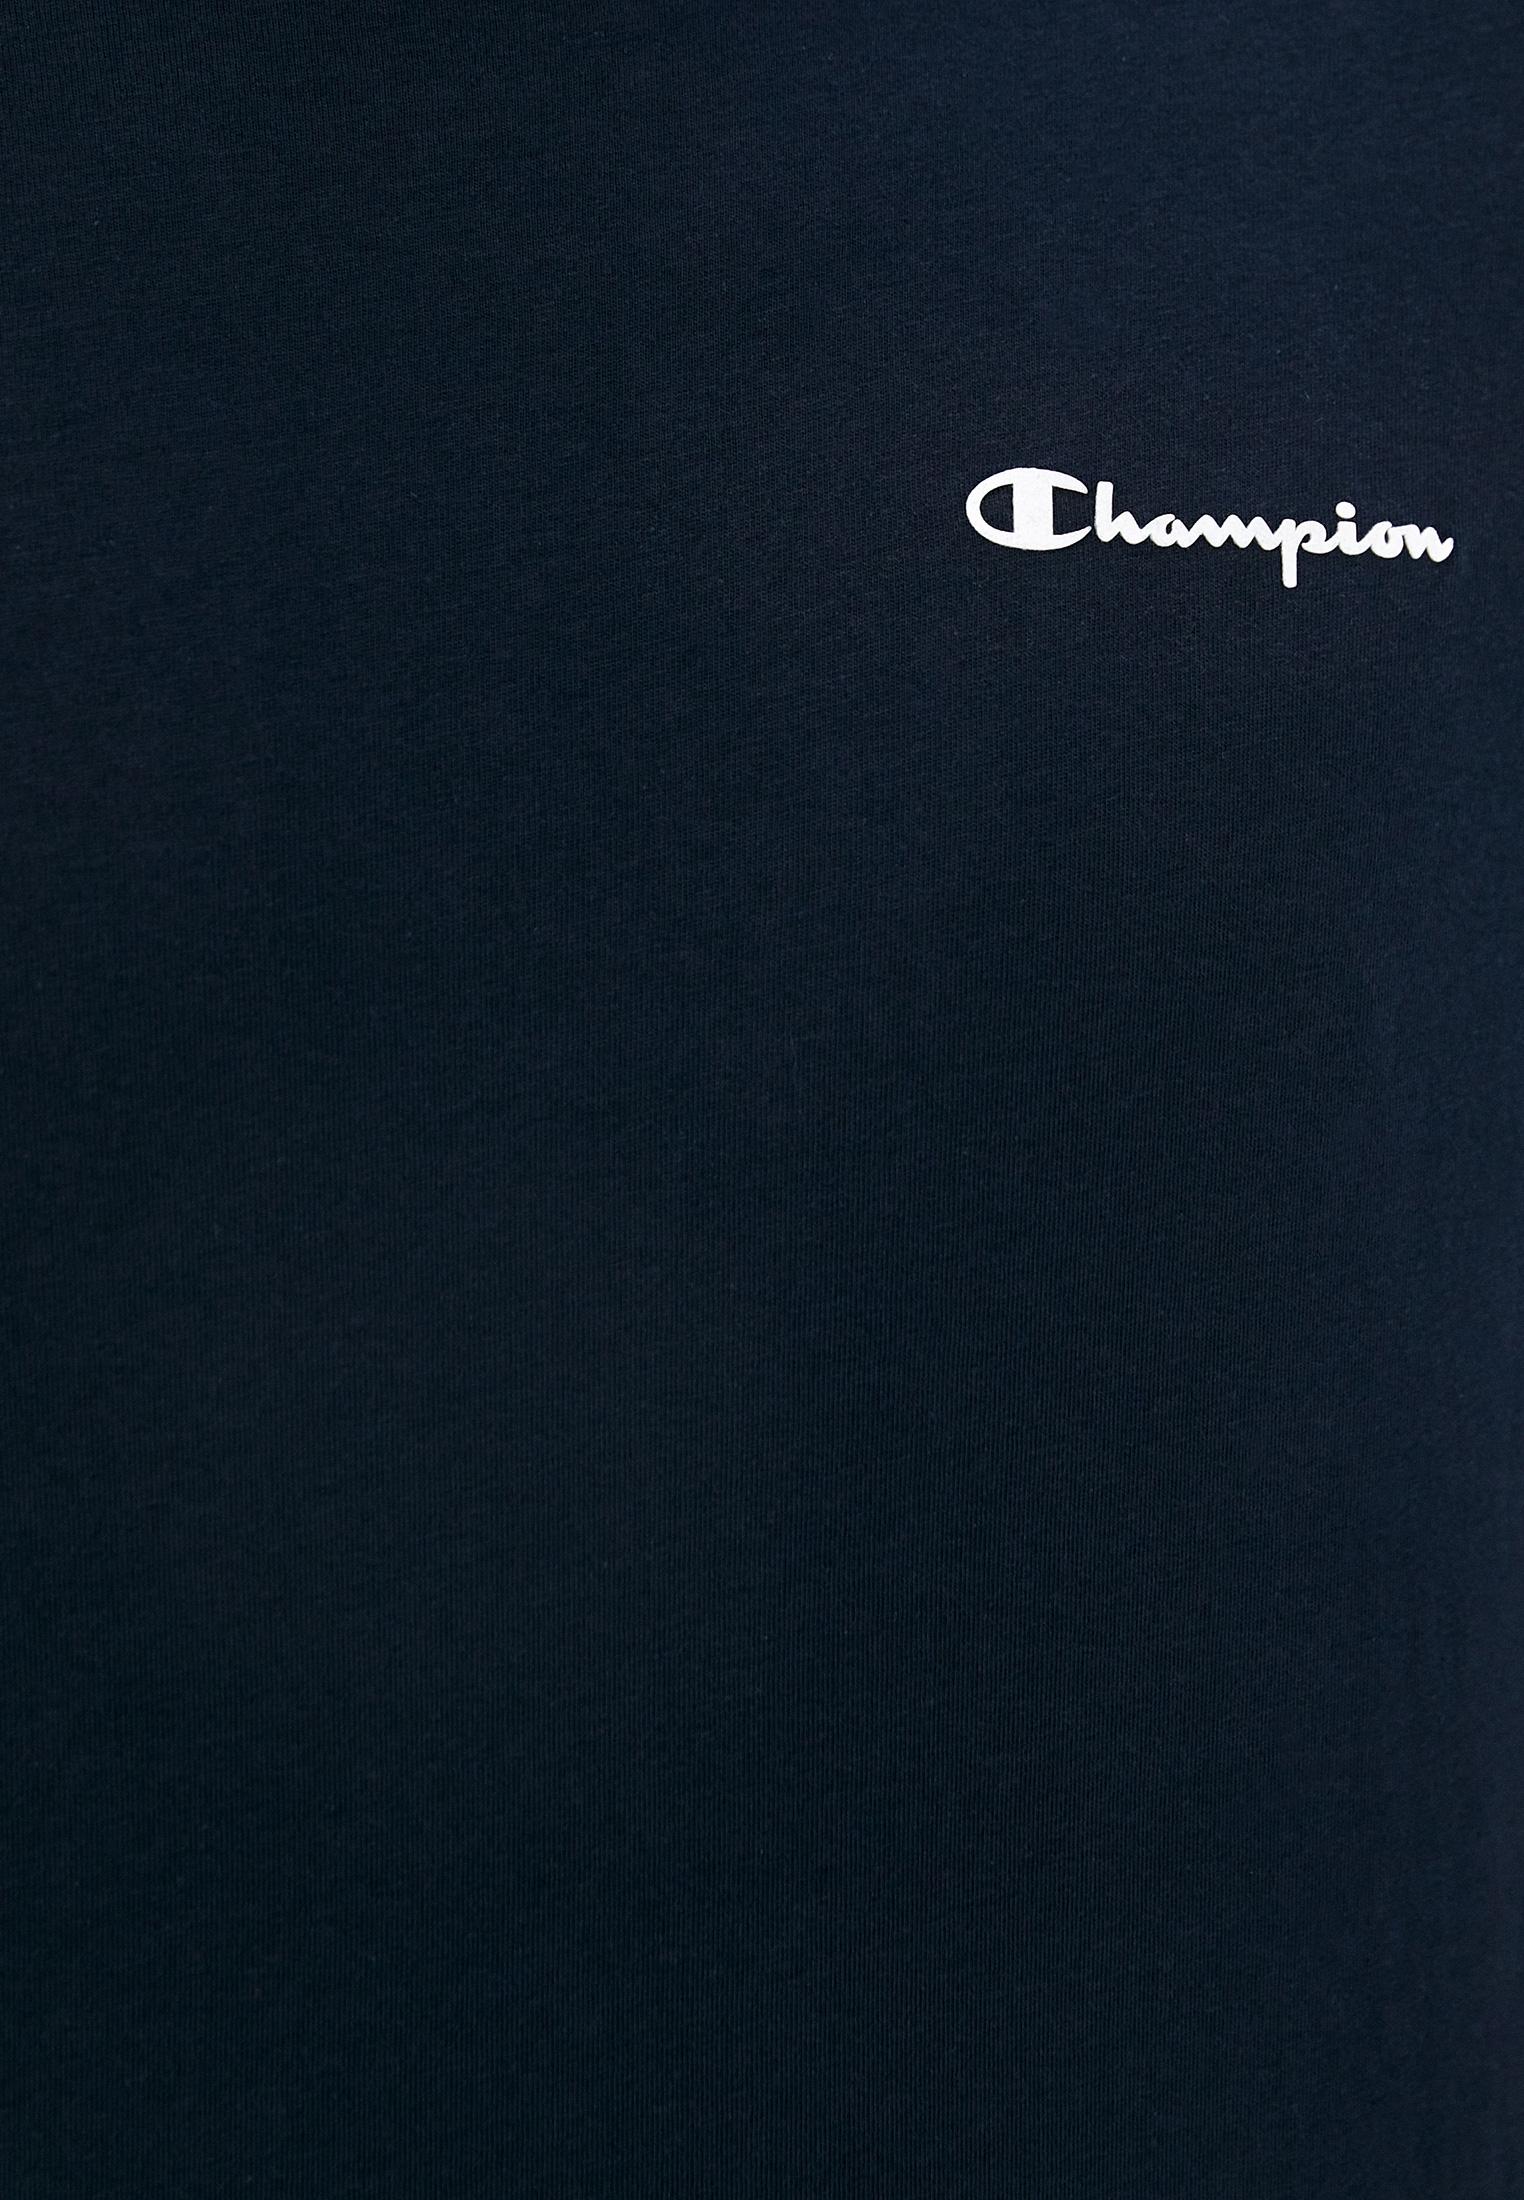 Футболка Champion (Чемпион) 214153: изображение 4